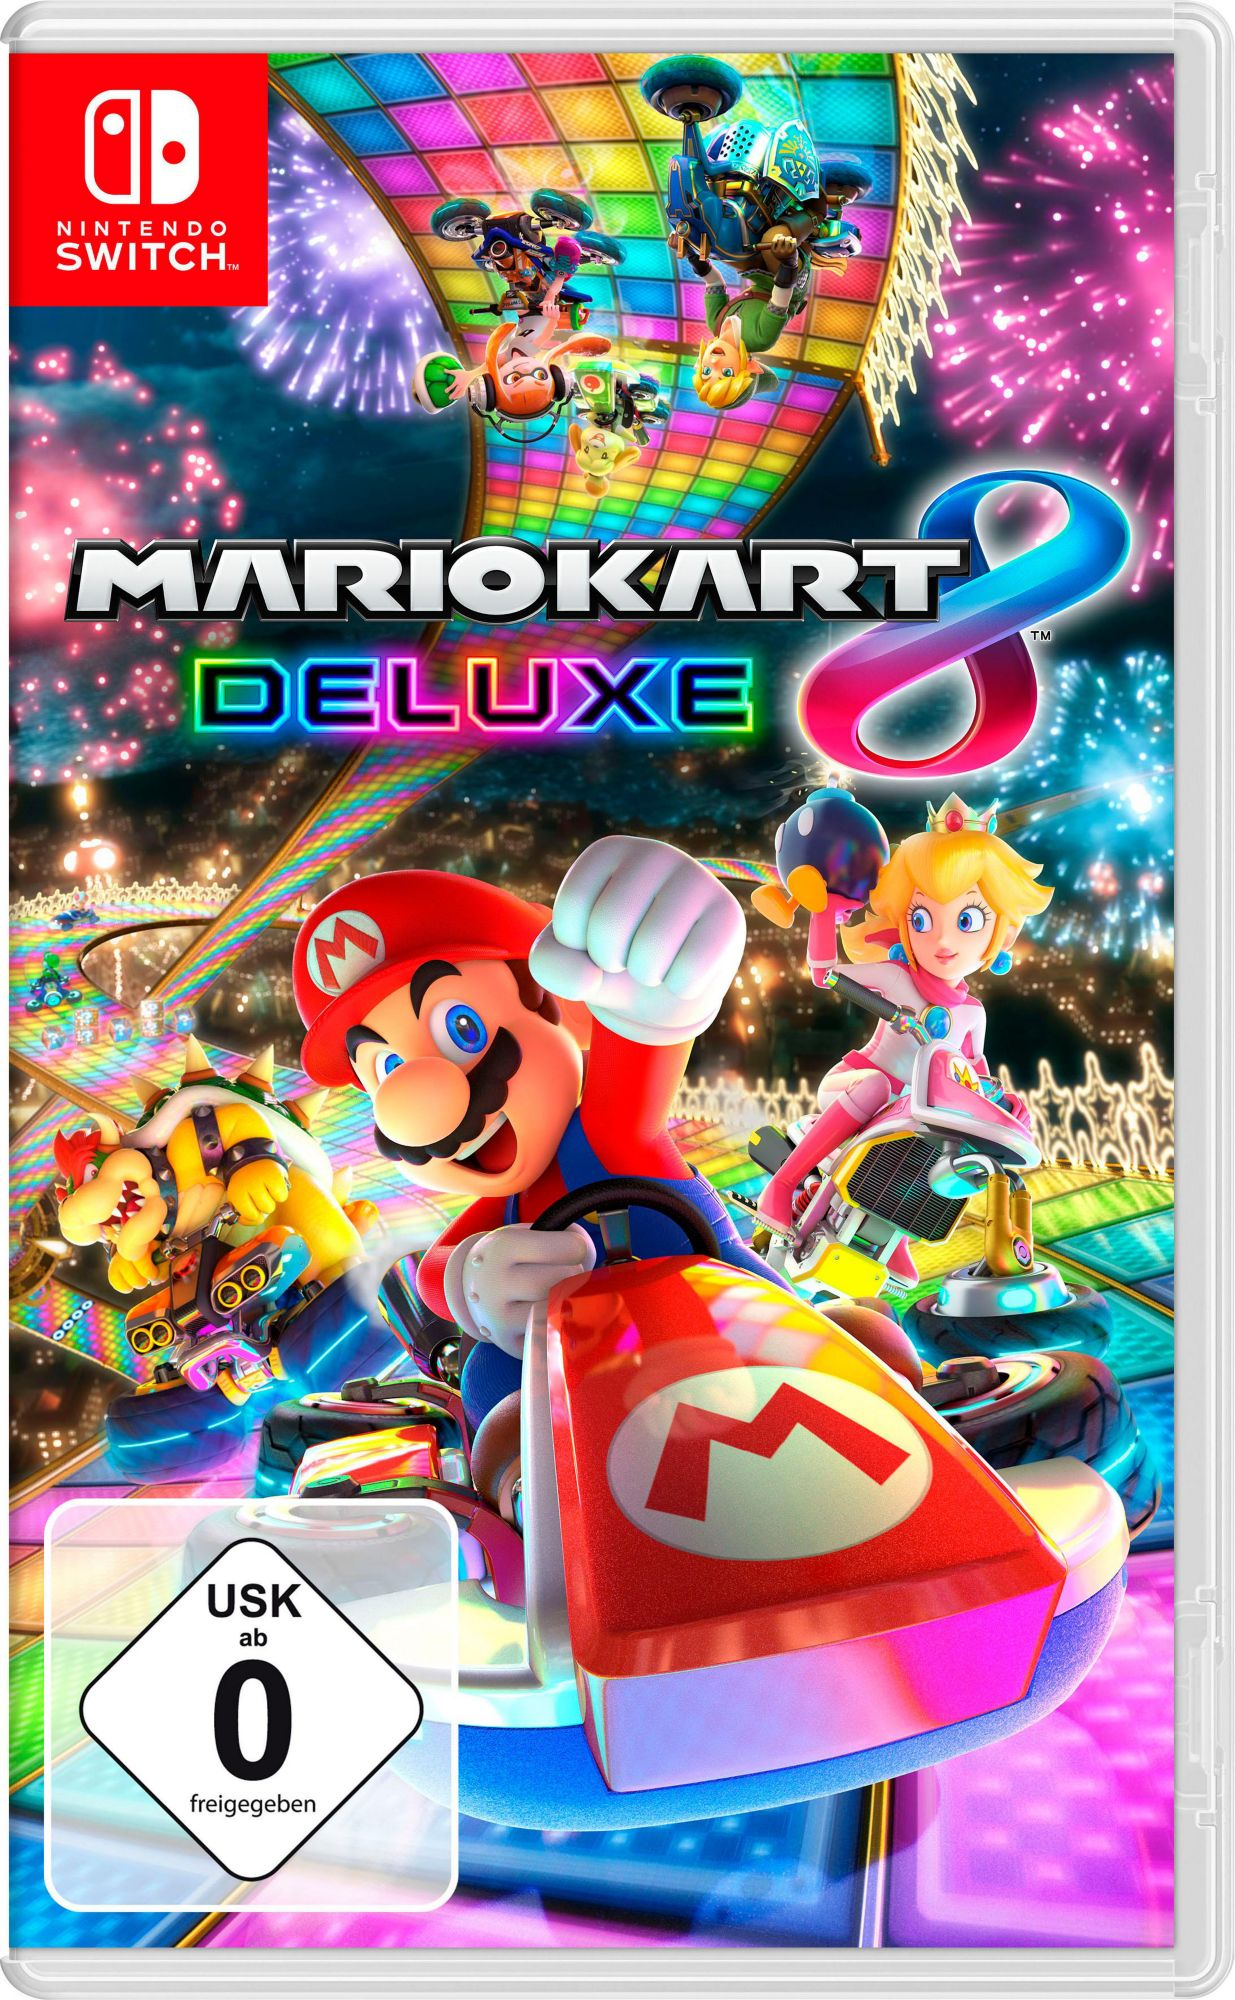 NINTENDO SWITCH Mario Kart 8 Deluxe (Nintendo Switch)